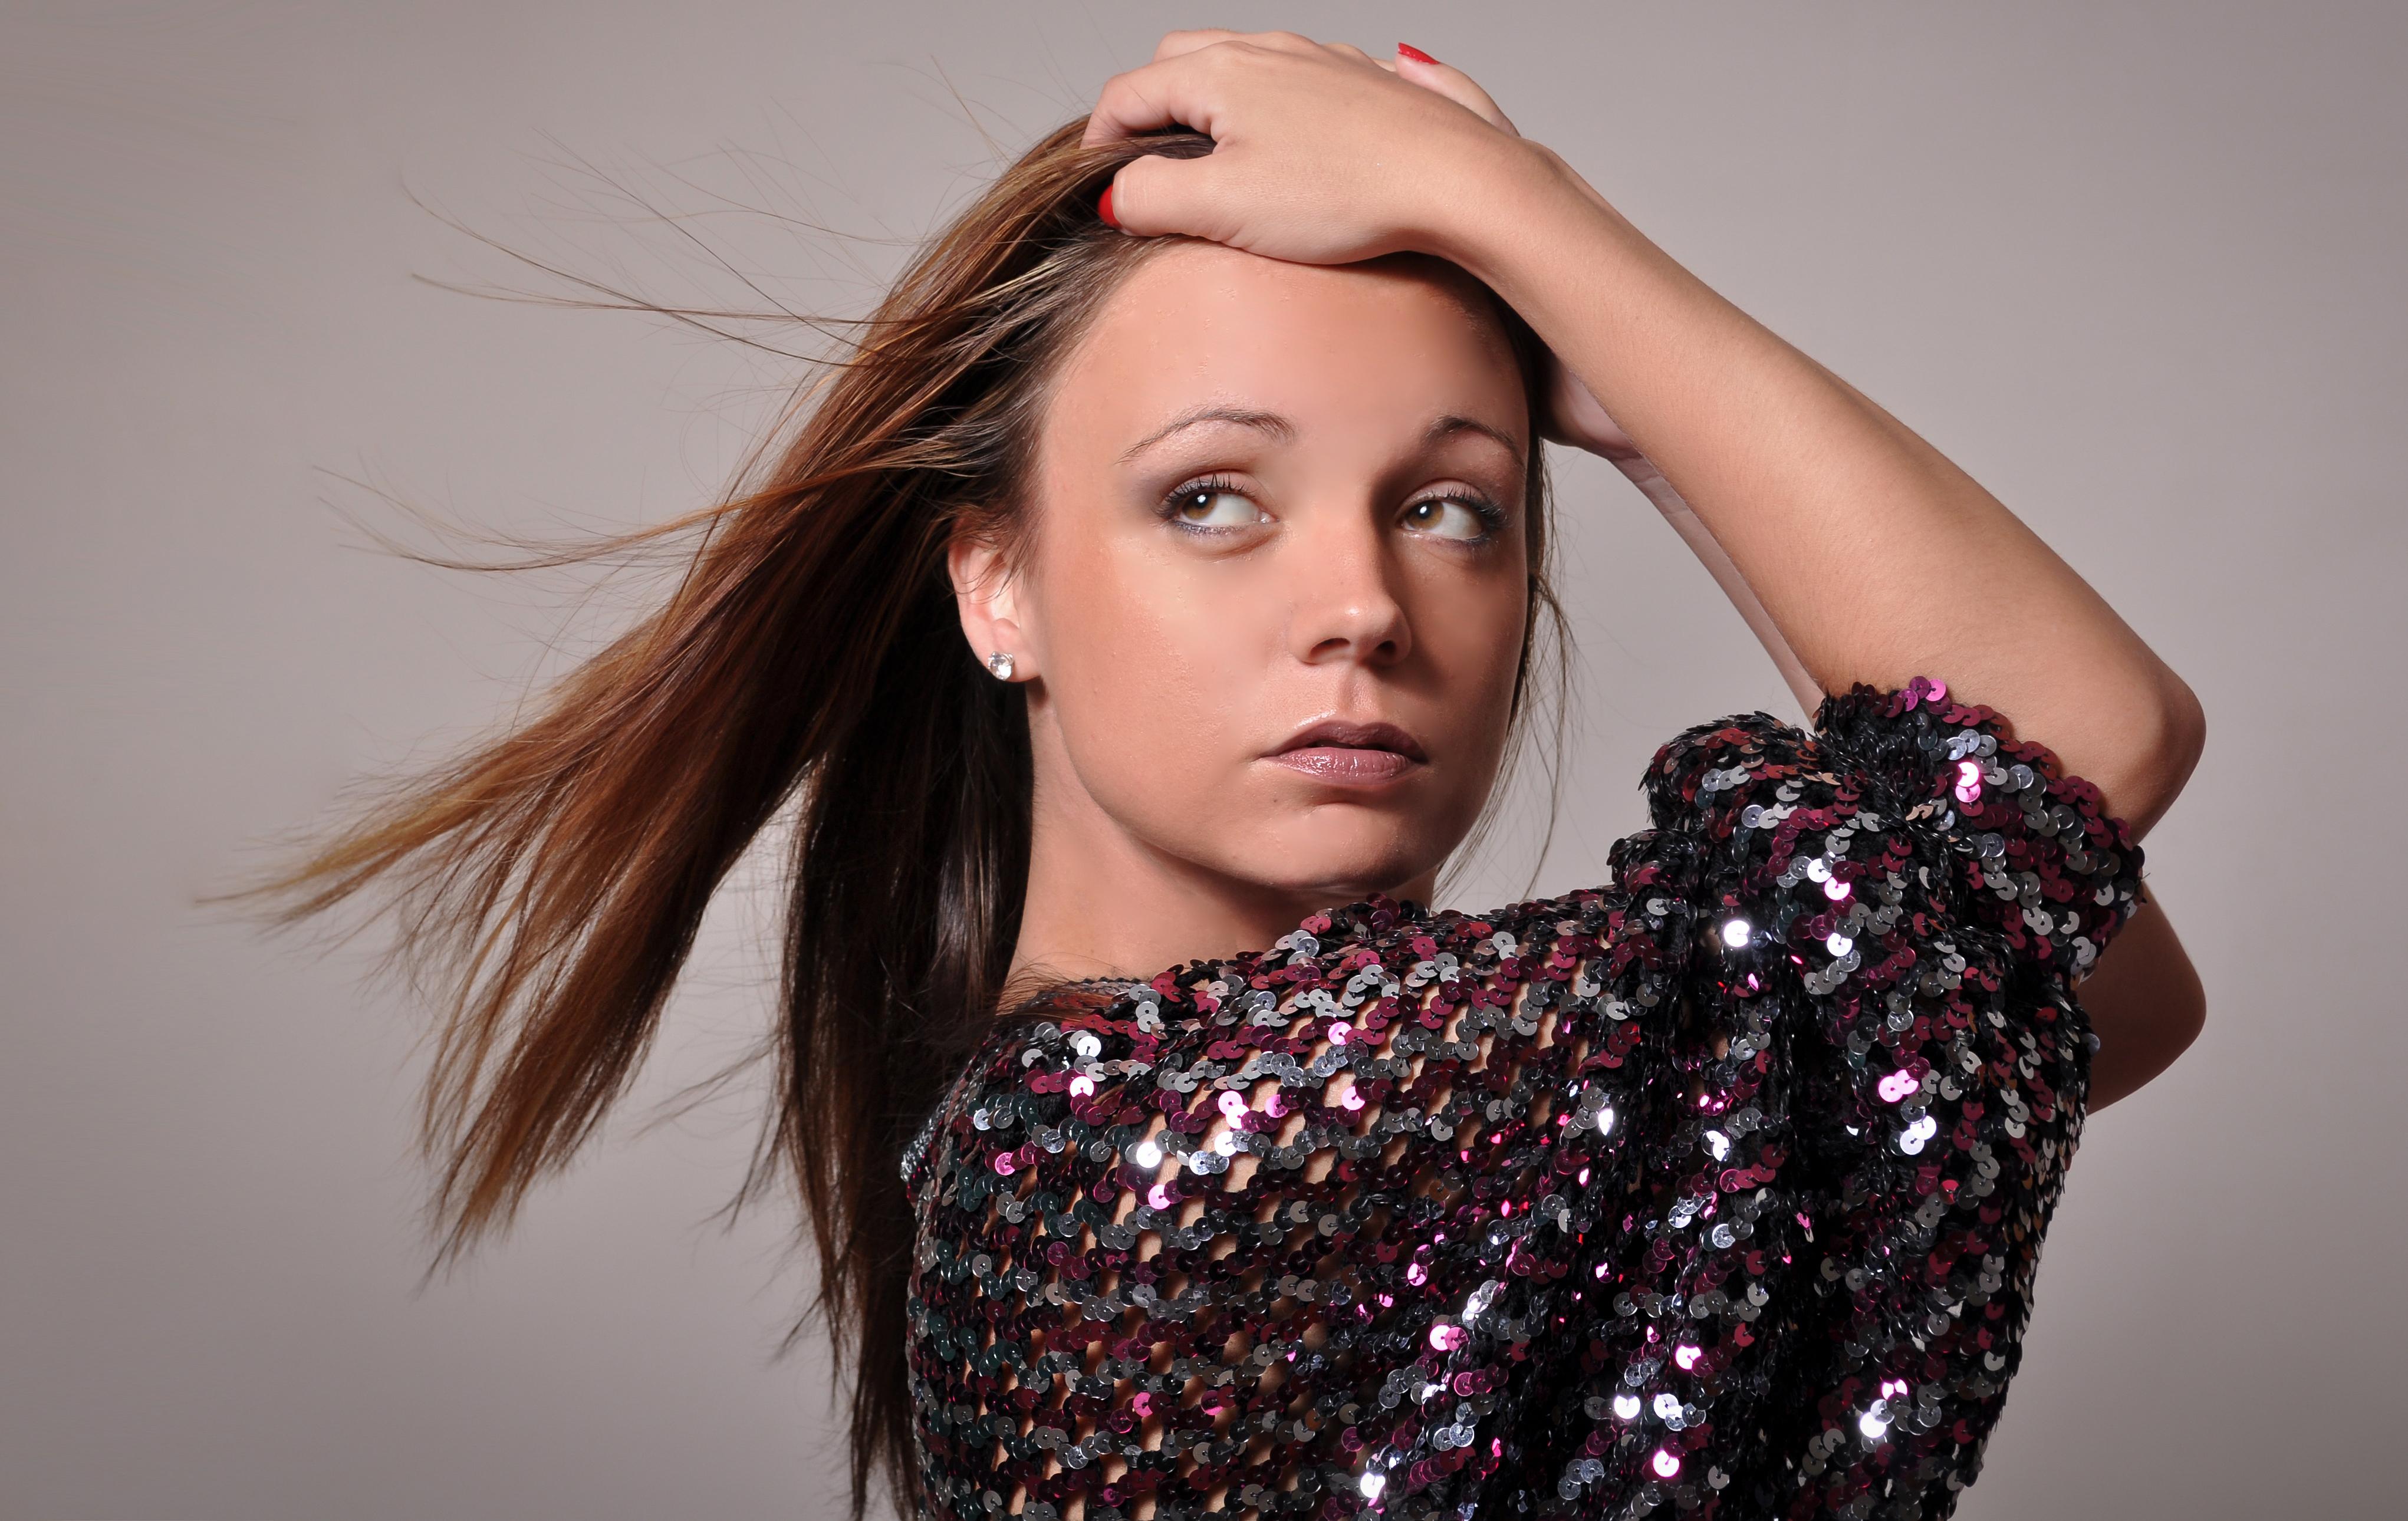 Makeup Artist Hair Salon MA NY NH VT